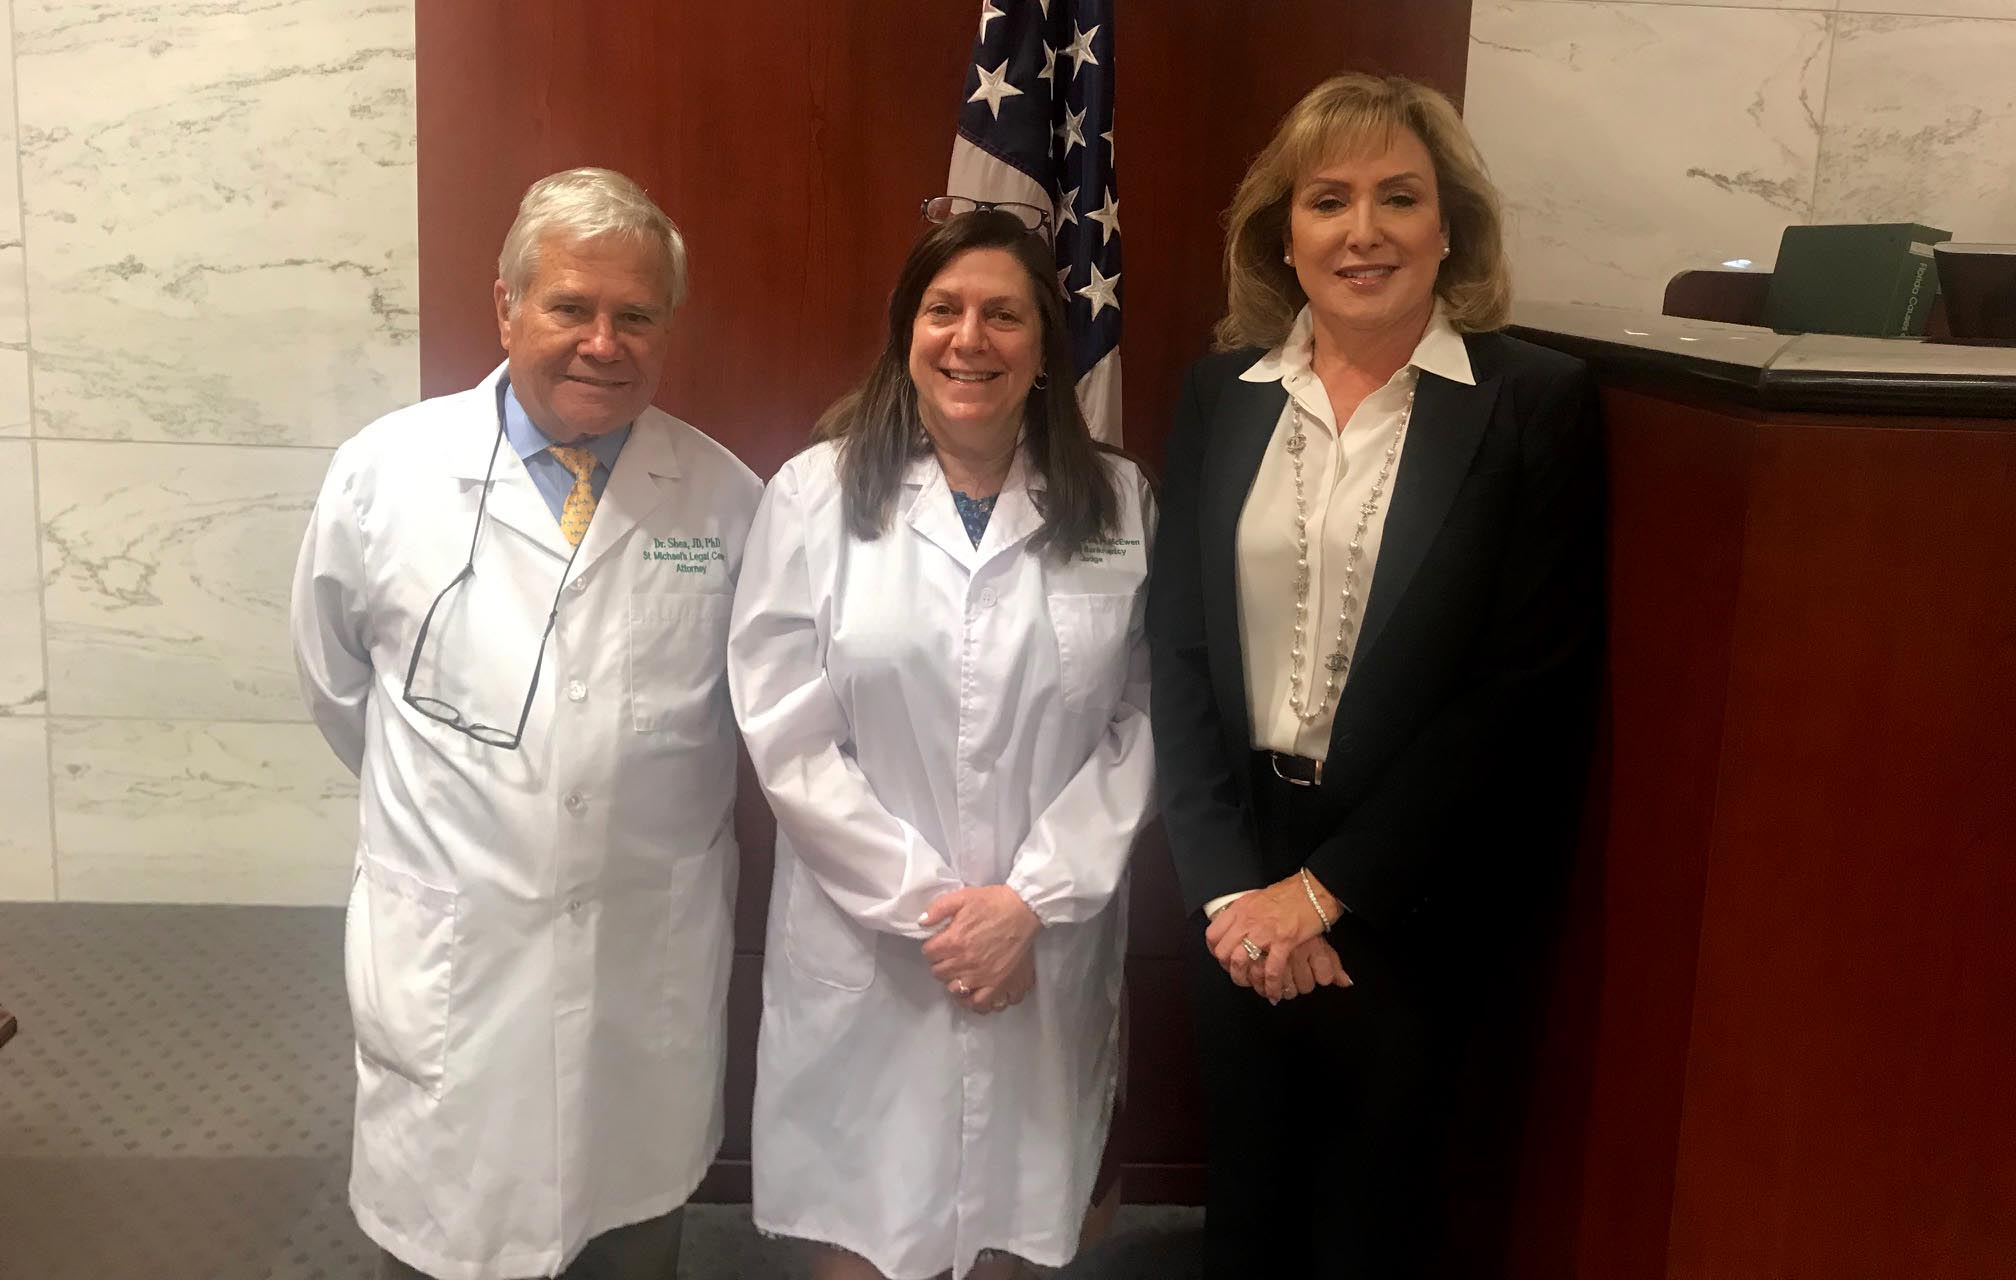 Michael Shea, Judge Catherine McEwen, and Kathleen McLeroy